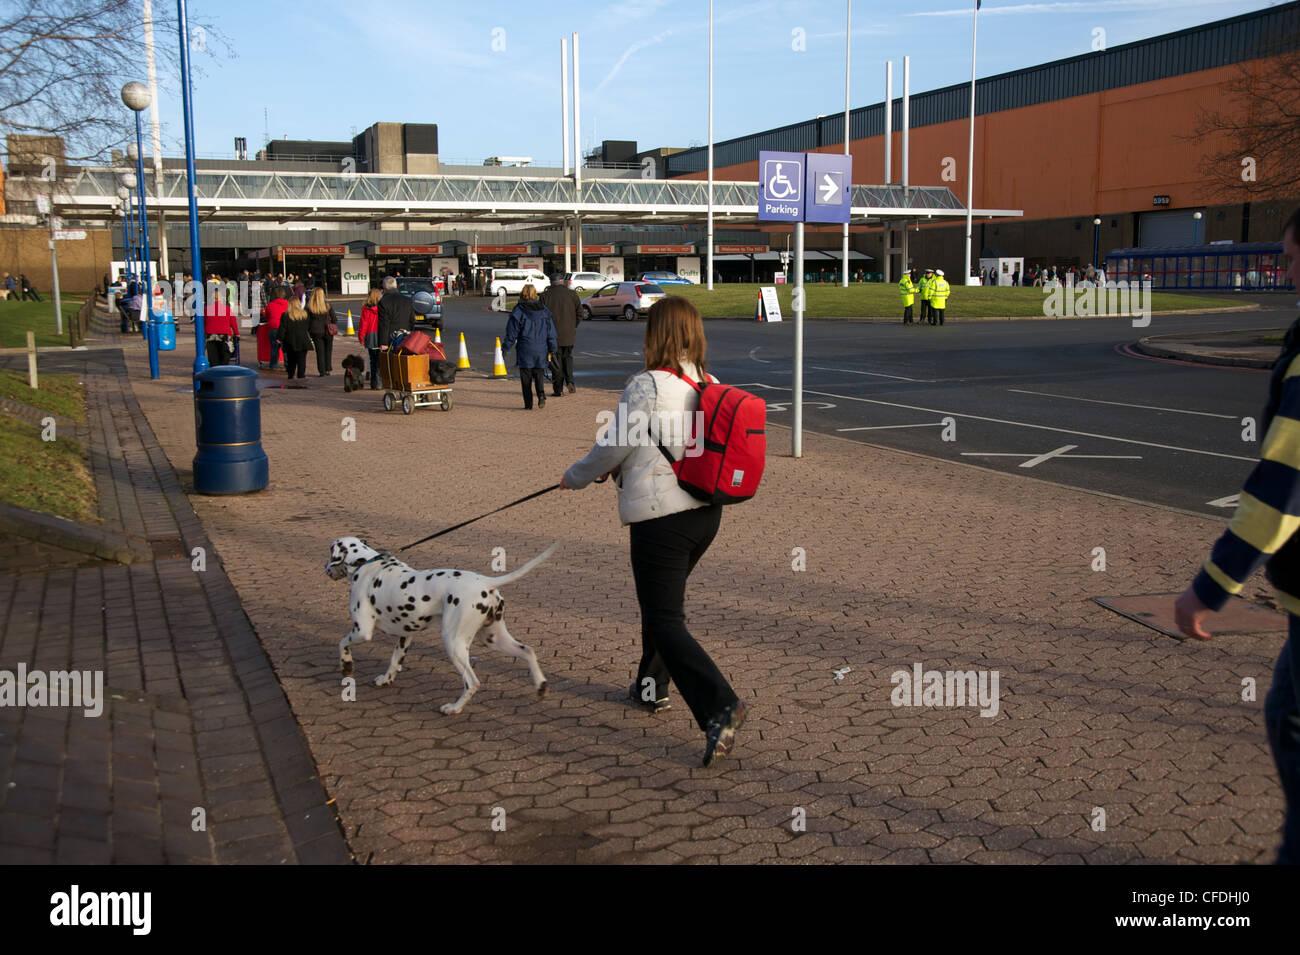 Crufts dog show 2011 - Stock Image